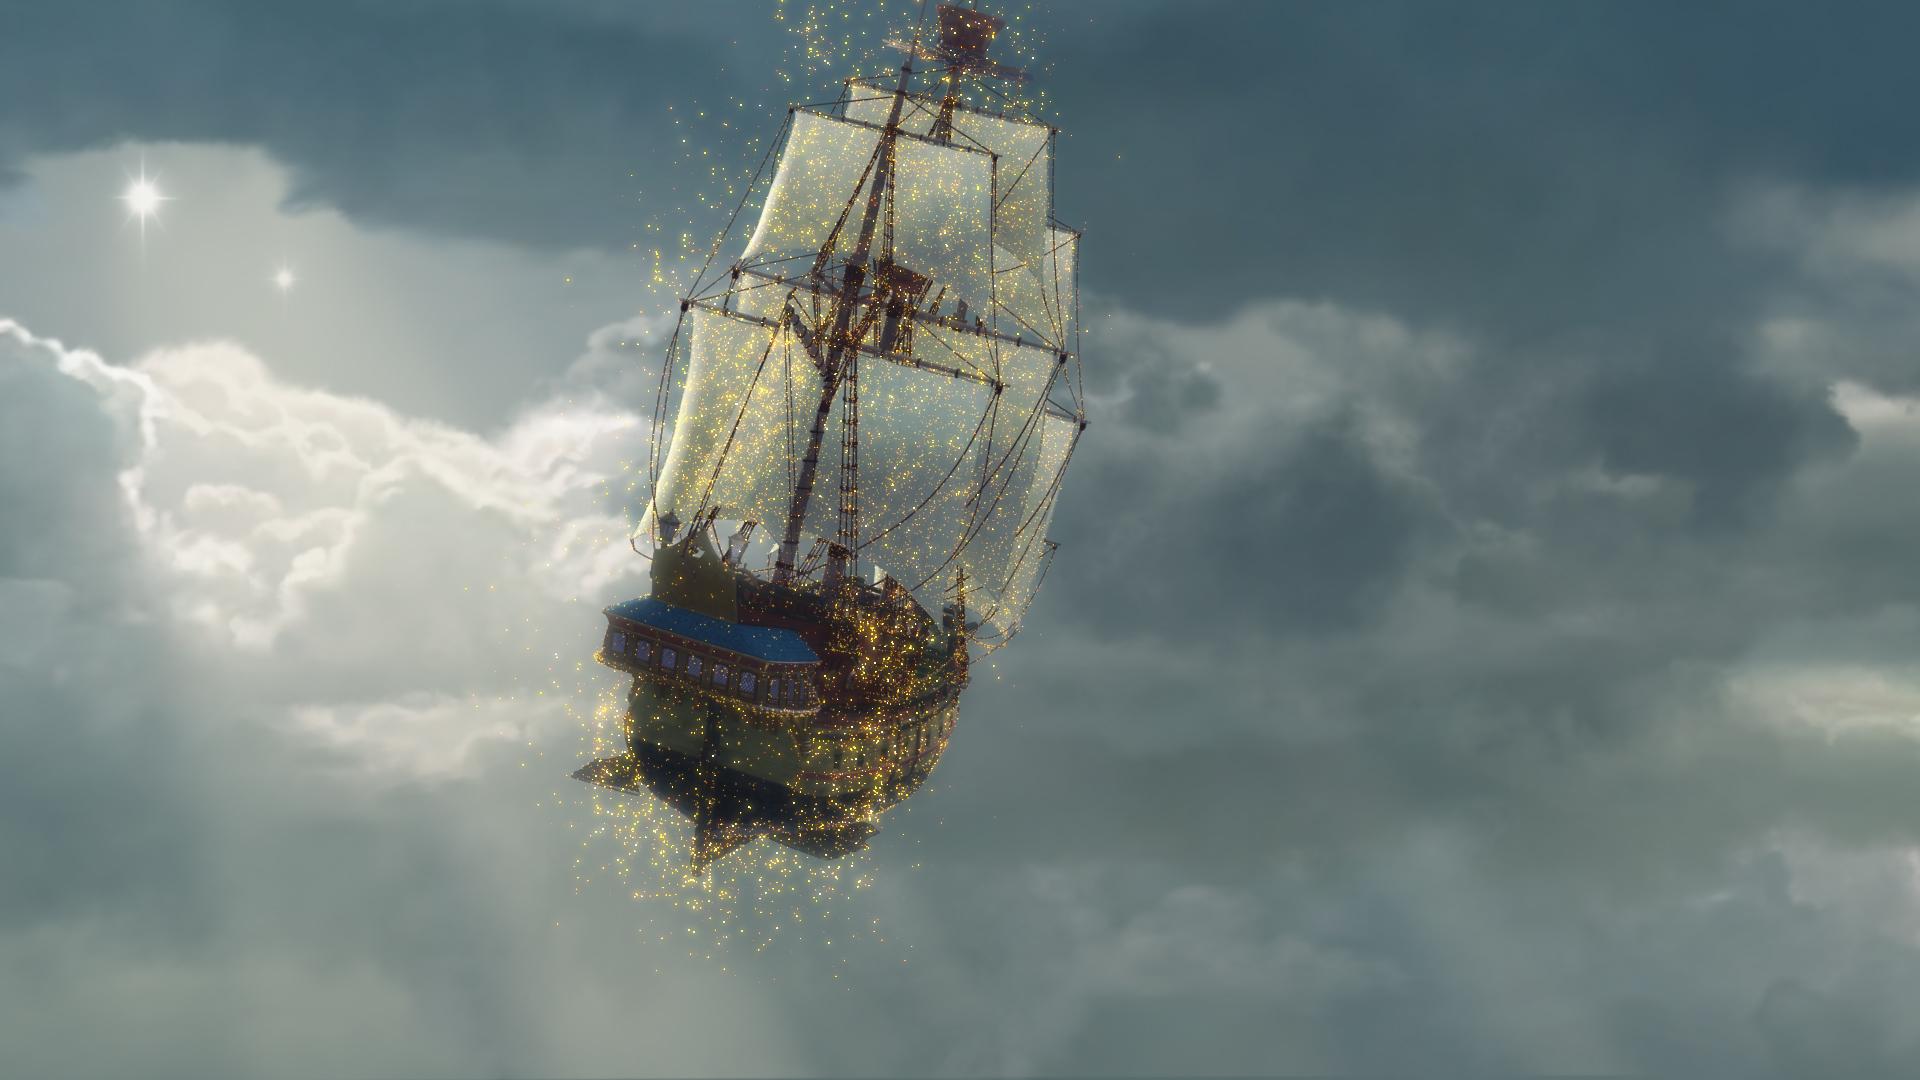 Jolly Roger Ship Peter Pan Pirate Party Pinterest Jolly